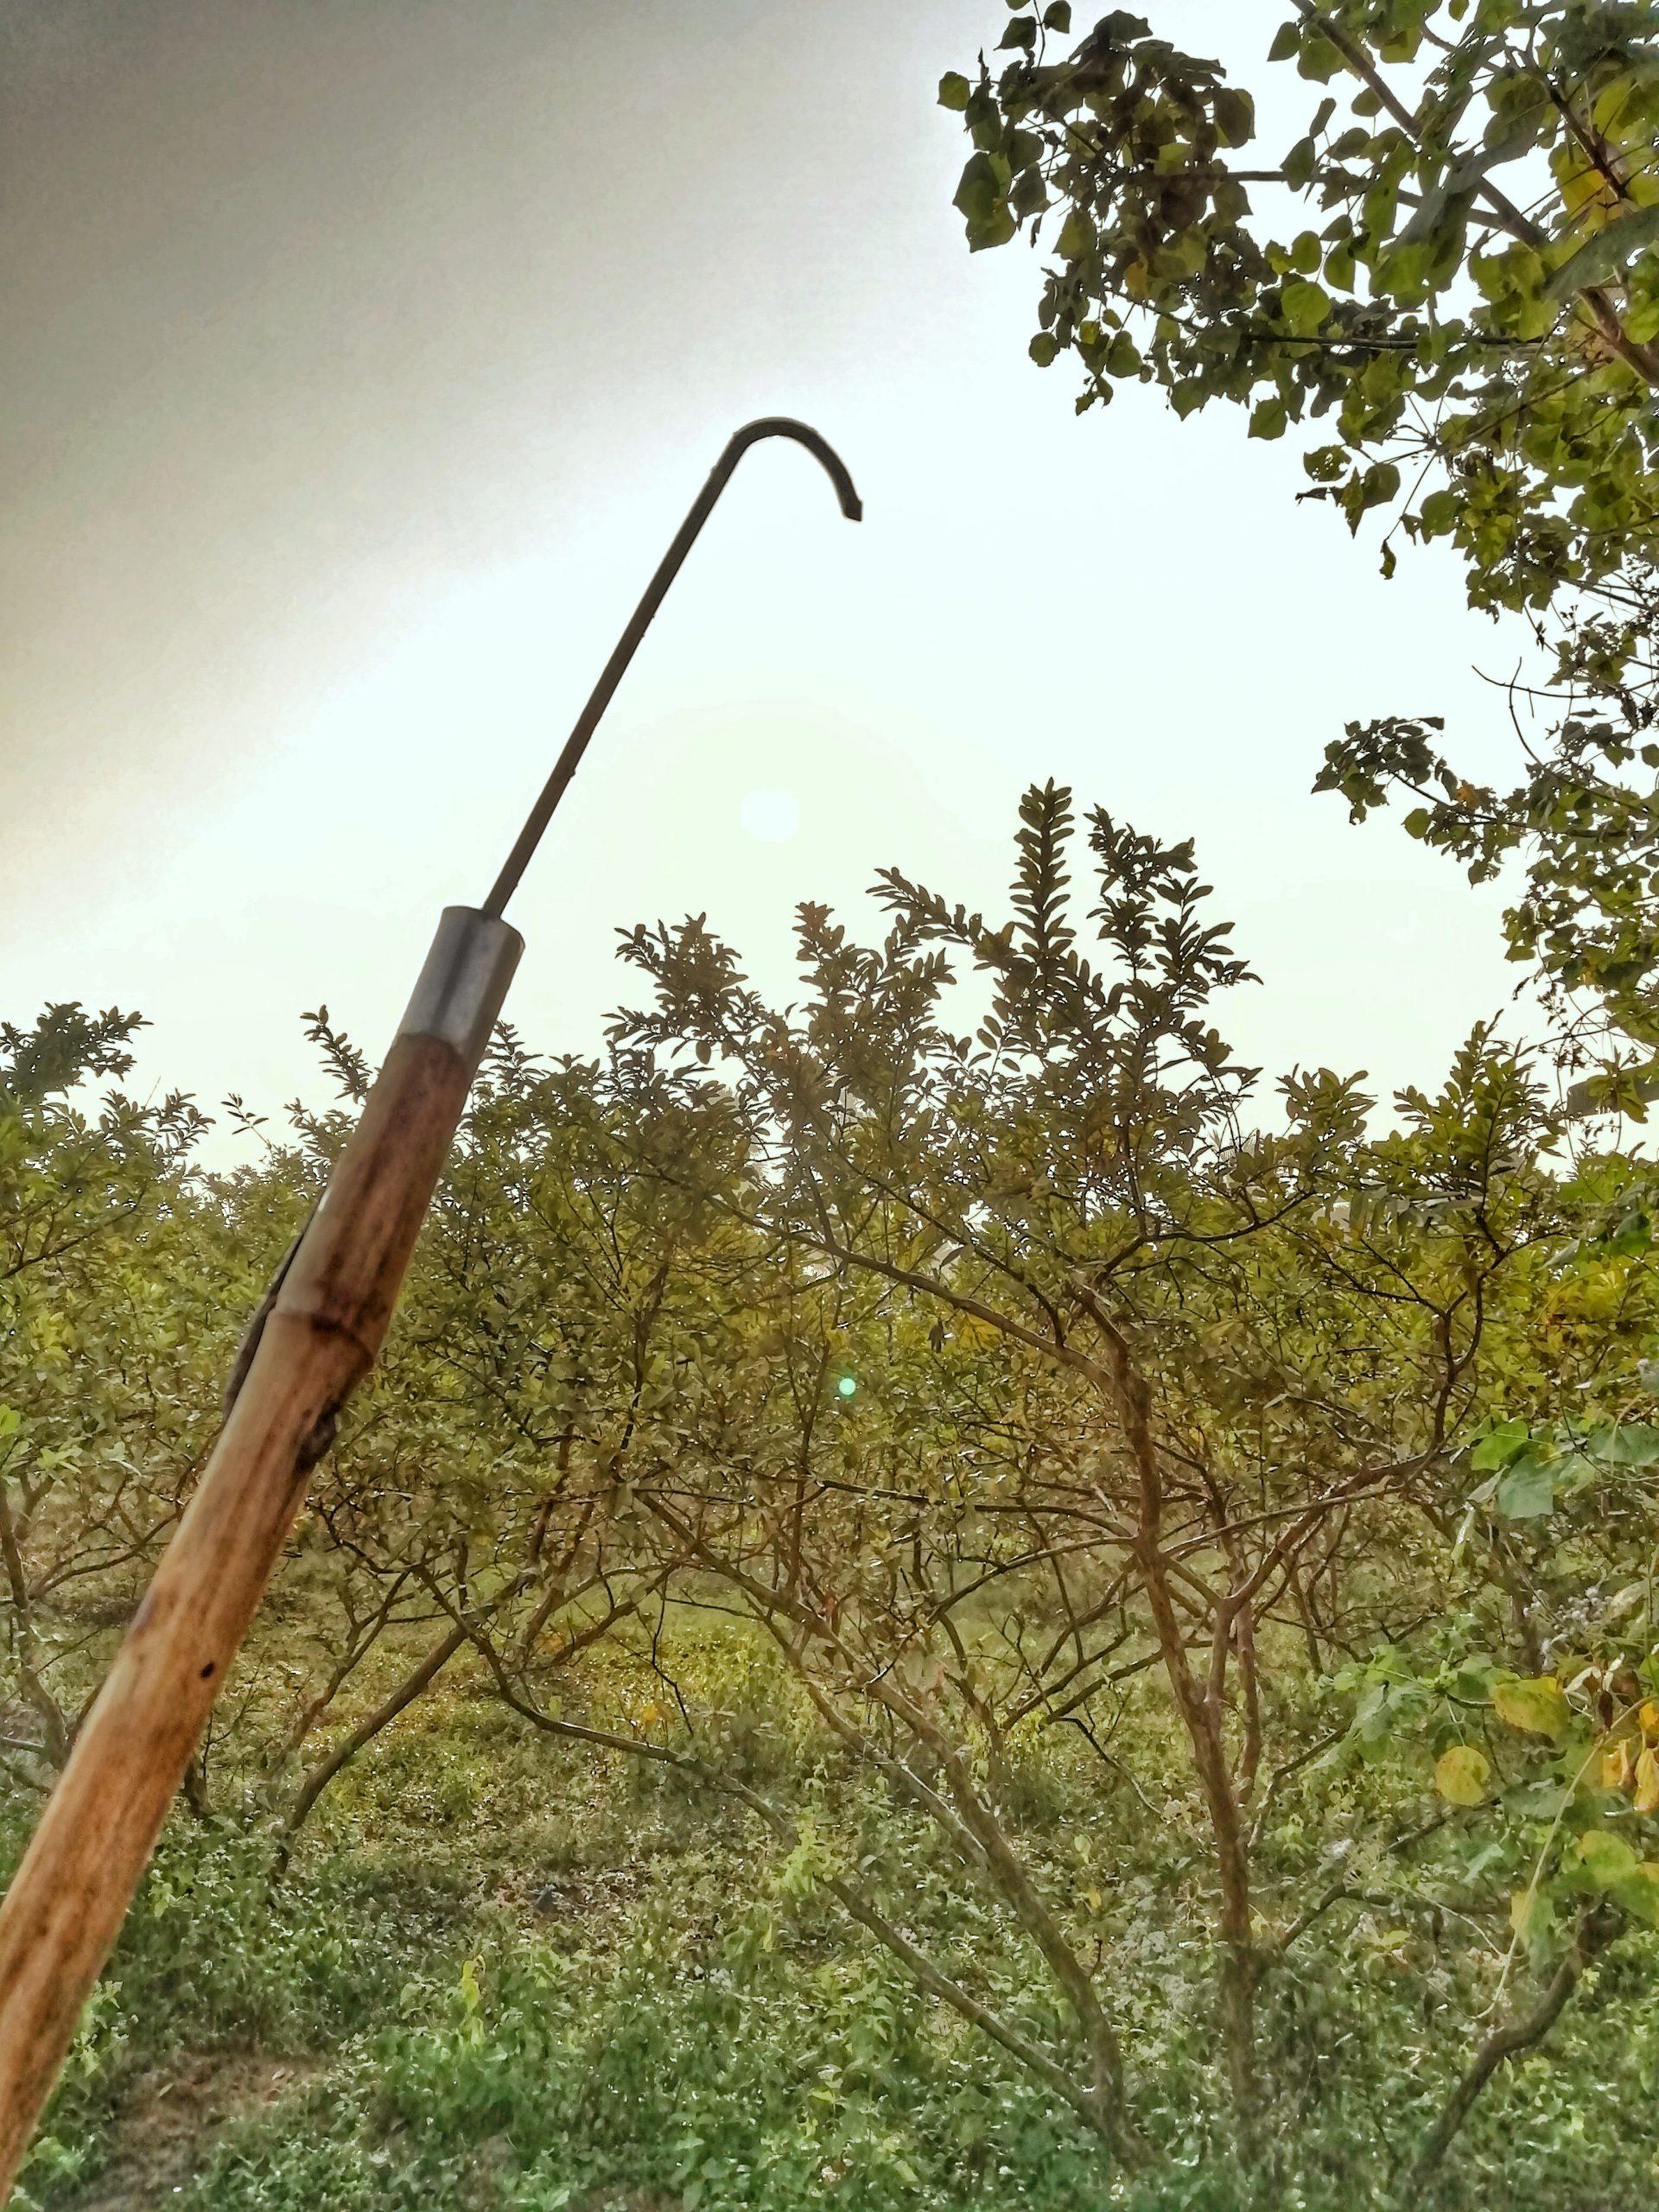 Hose in a stick at farm